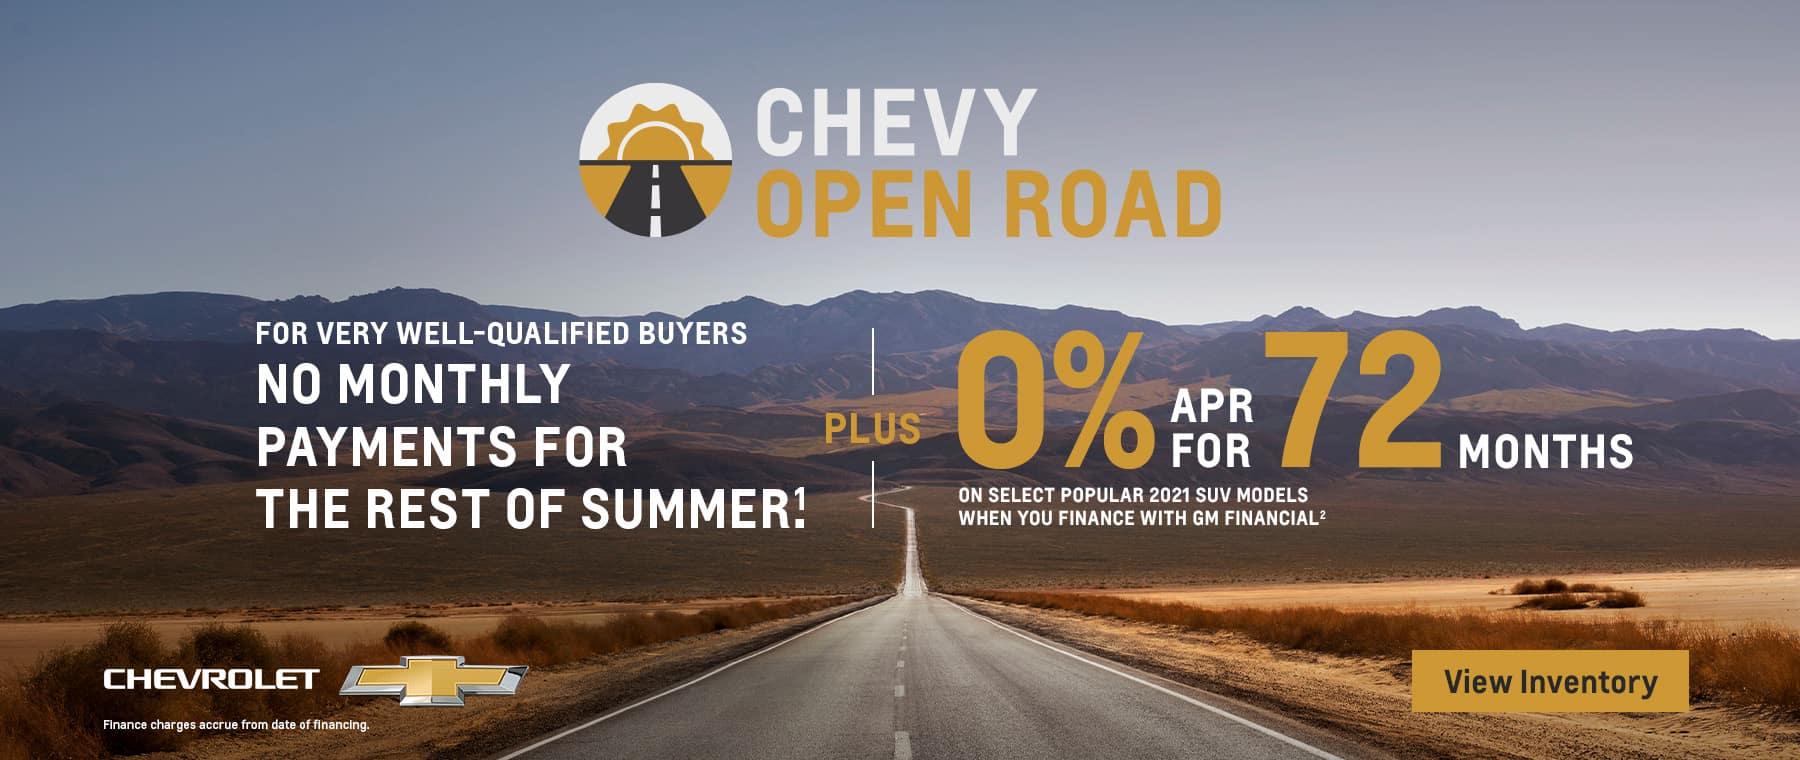 2021 Chevy Open Road